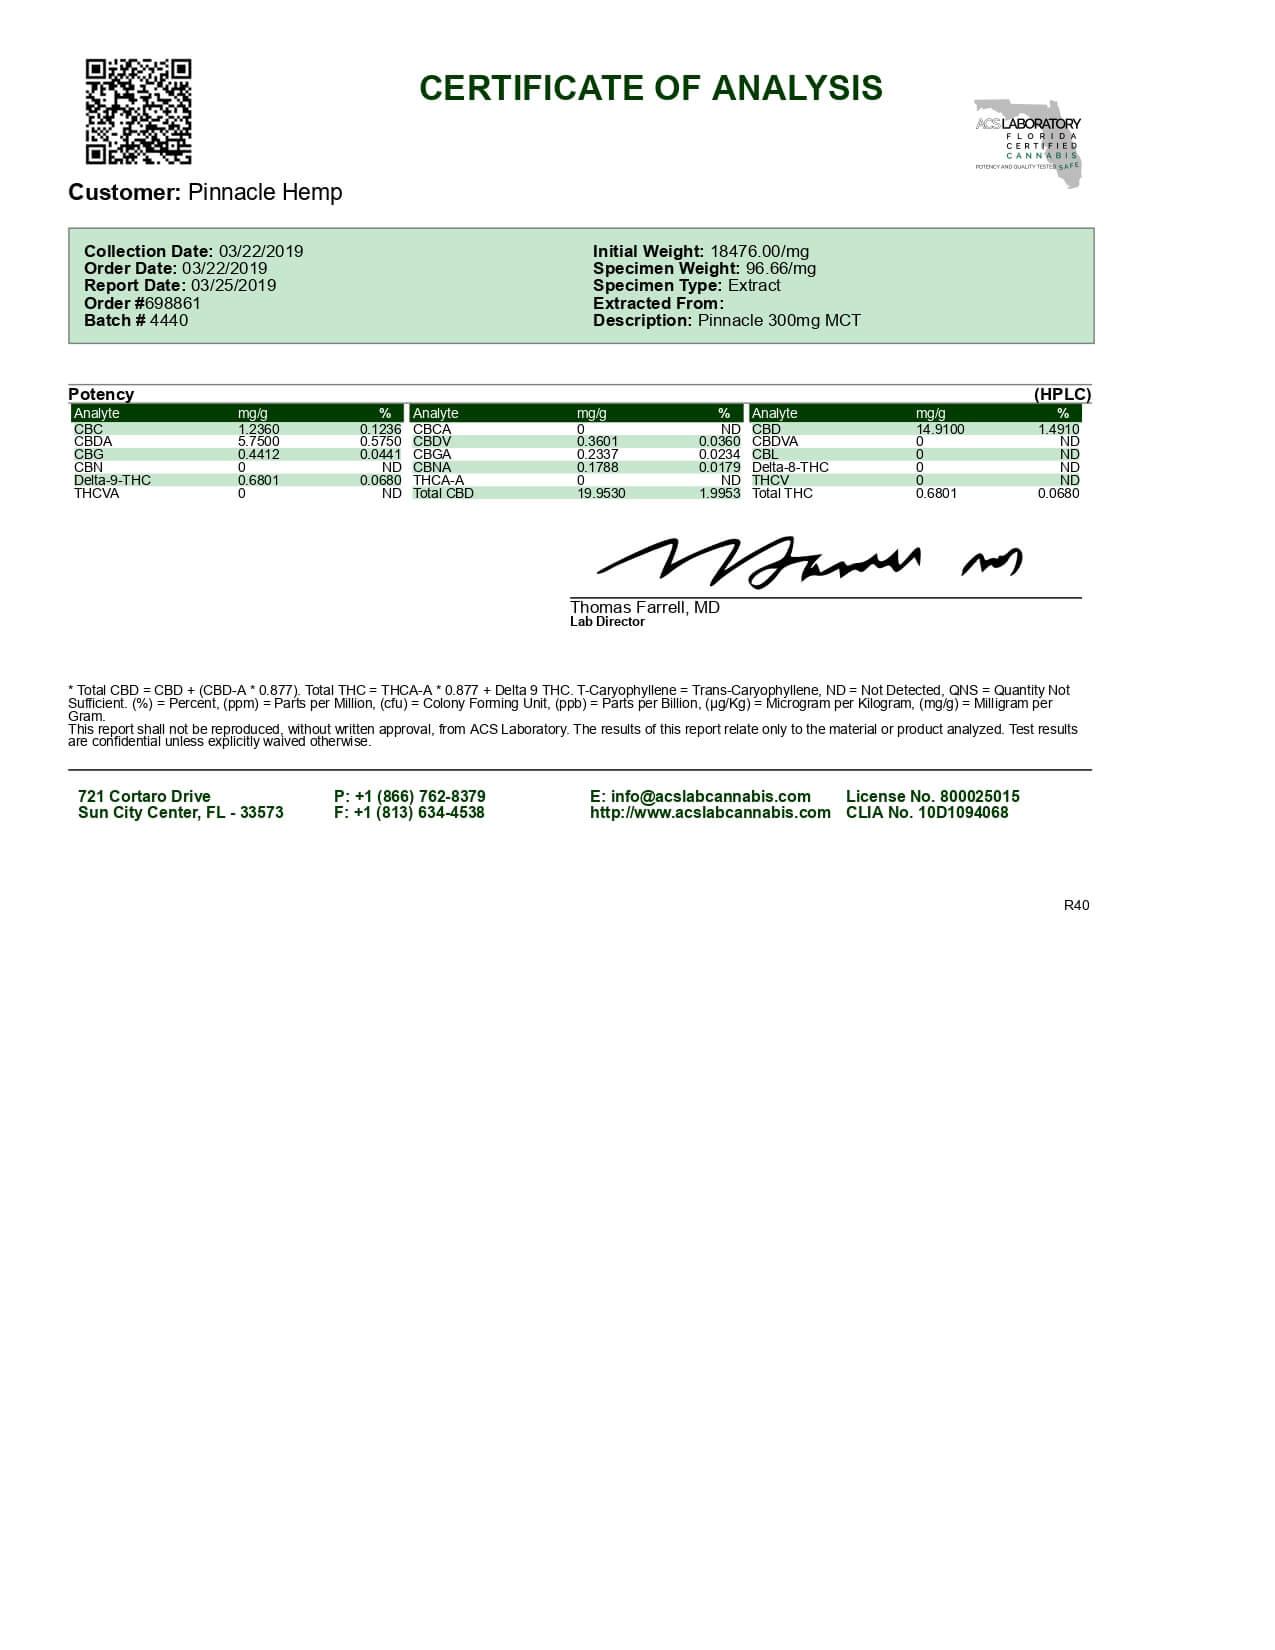 Pinnacle Hemp CBD Tincture Full Spectrum MCT Oil 300mg Lab Report